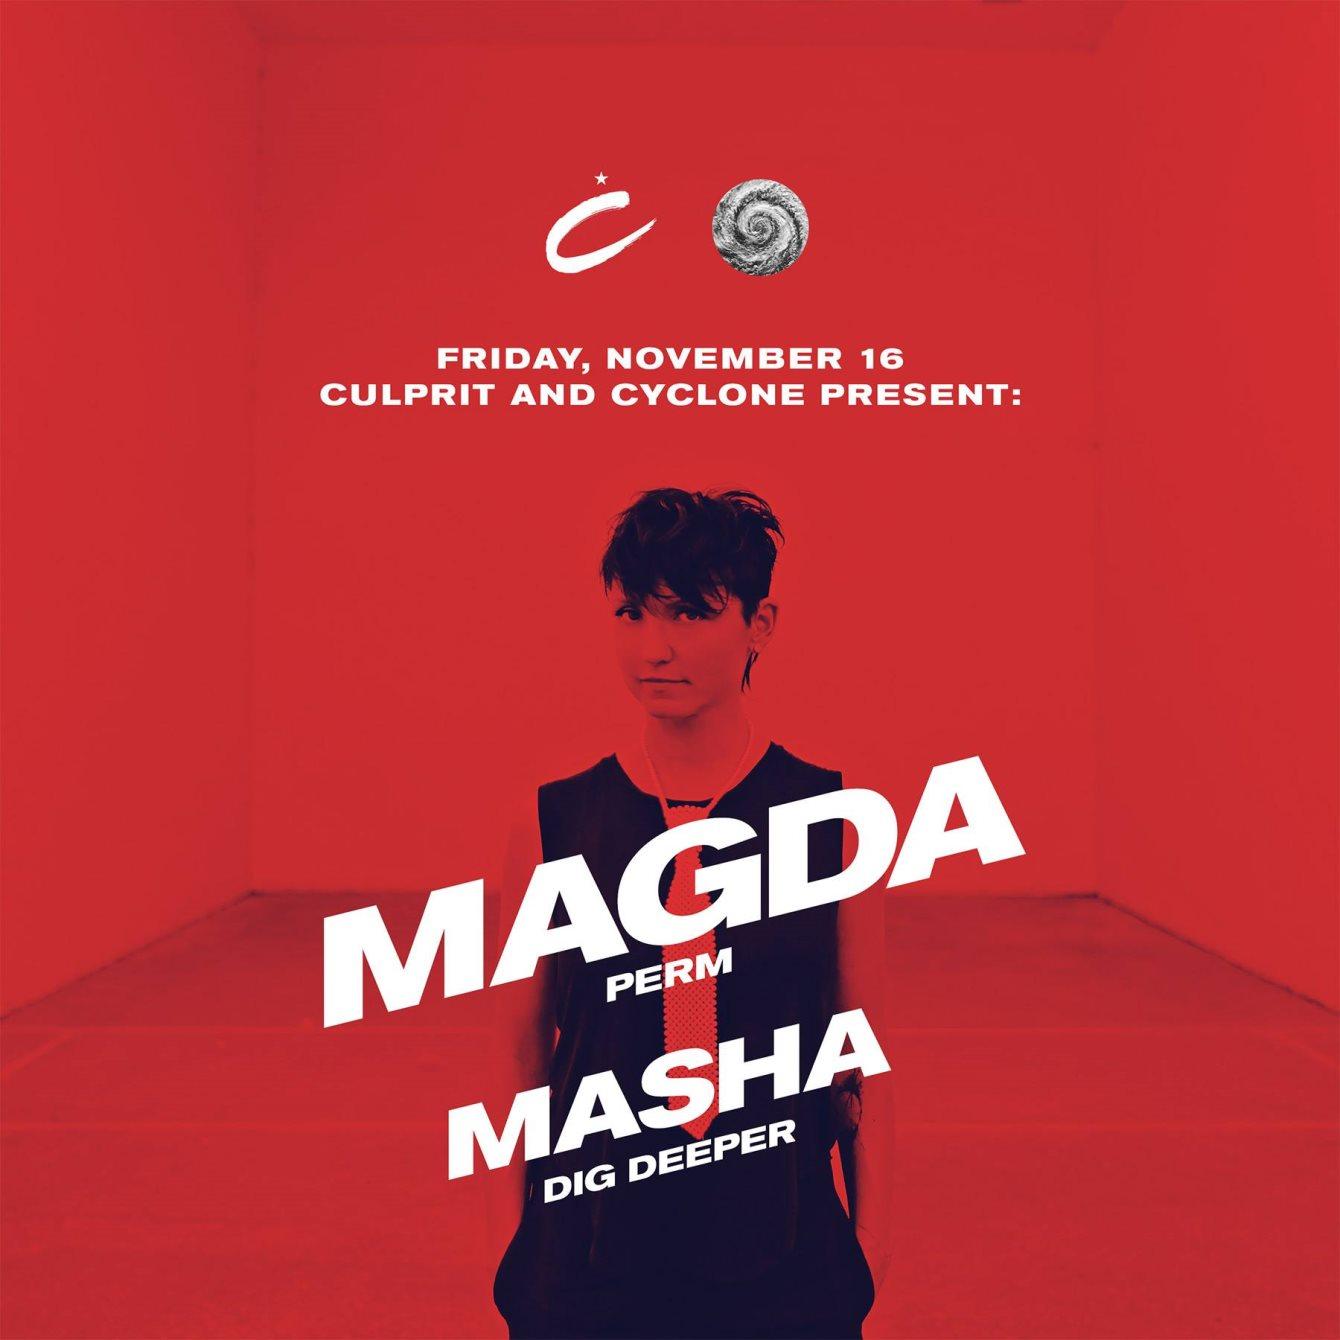 Culprit & Cyclone with Magda & Masha - Flyer front